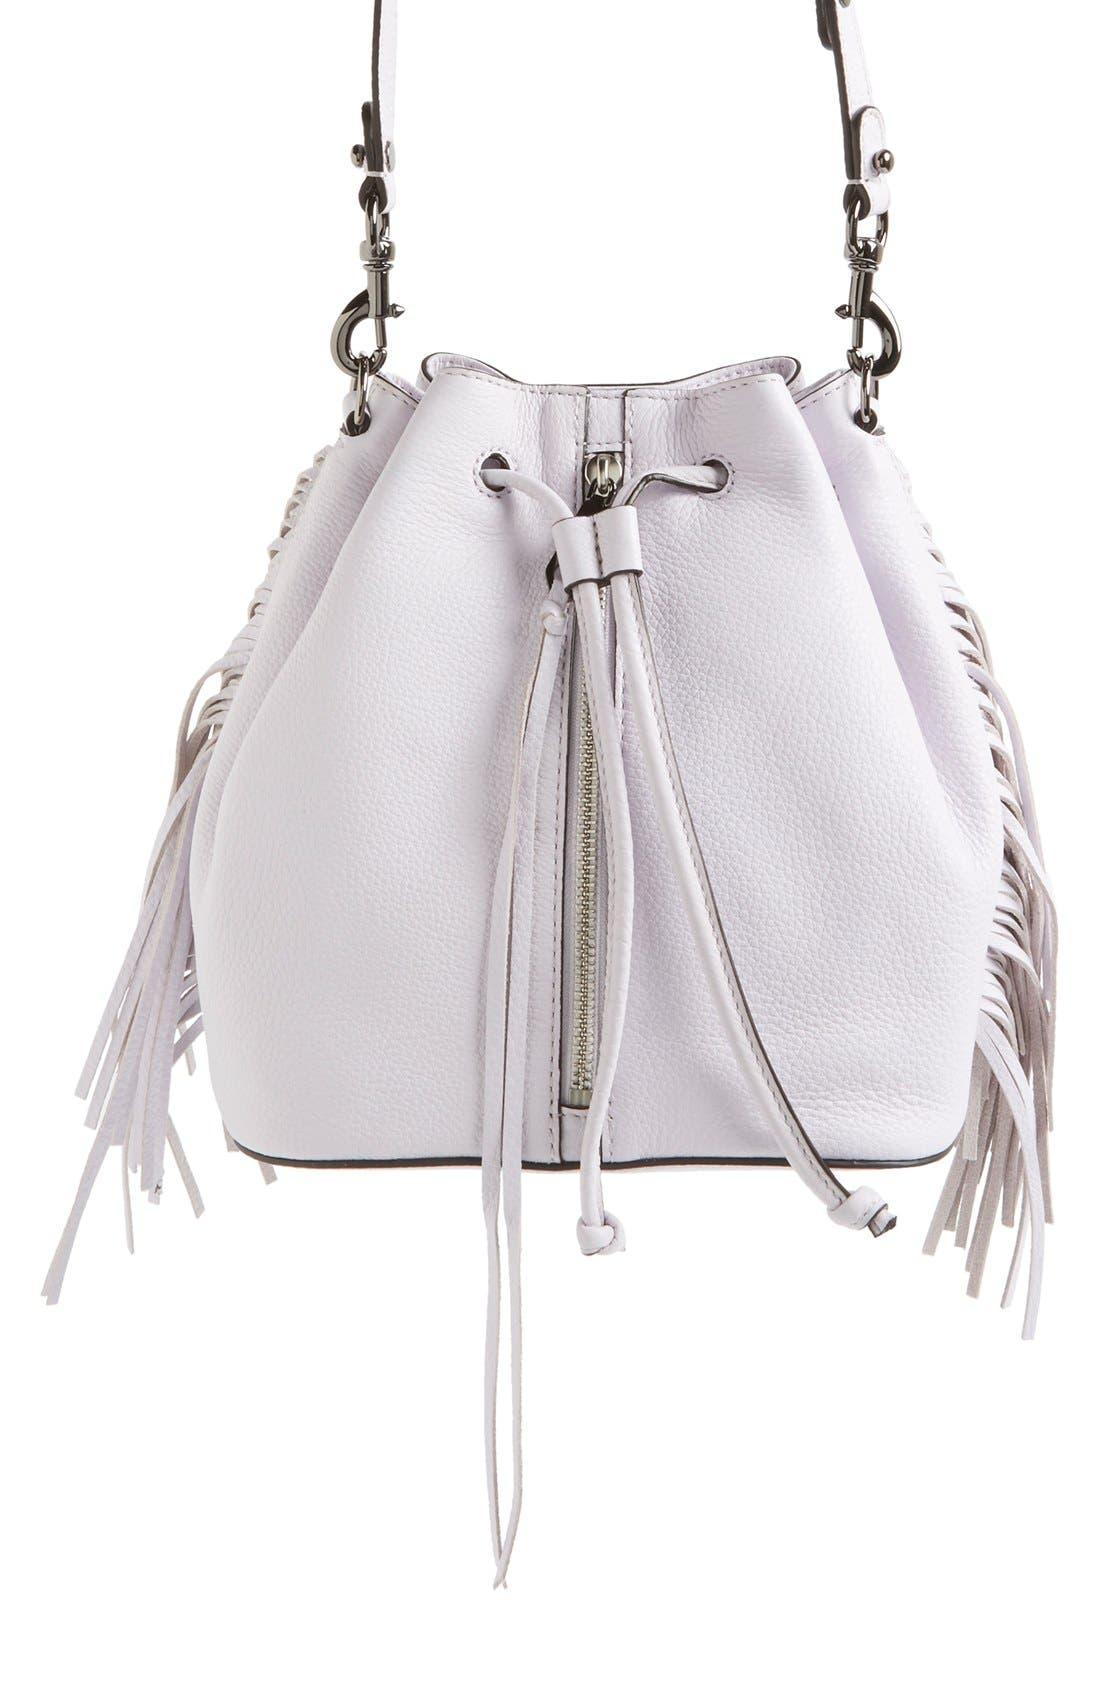 Alternate Image 1 Selected - Rebecca Minkoff 'Mini Fringe Moto' Bucket Bag (Nordstrom Exclusive)